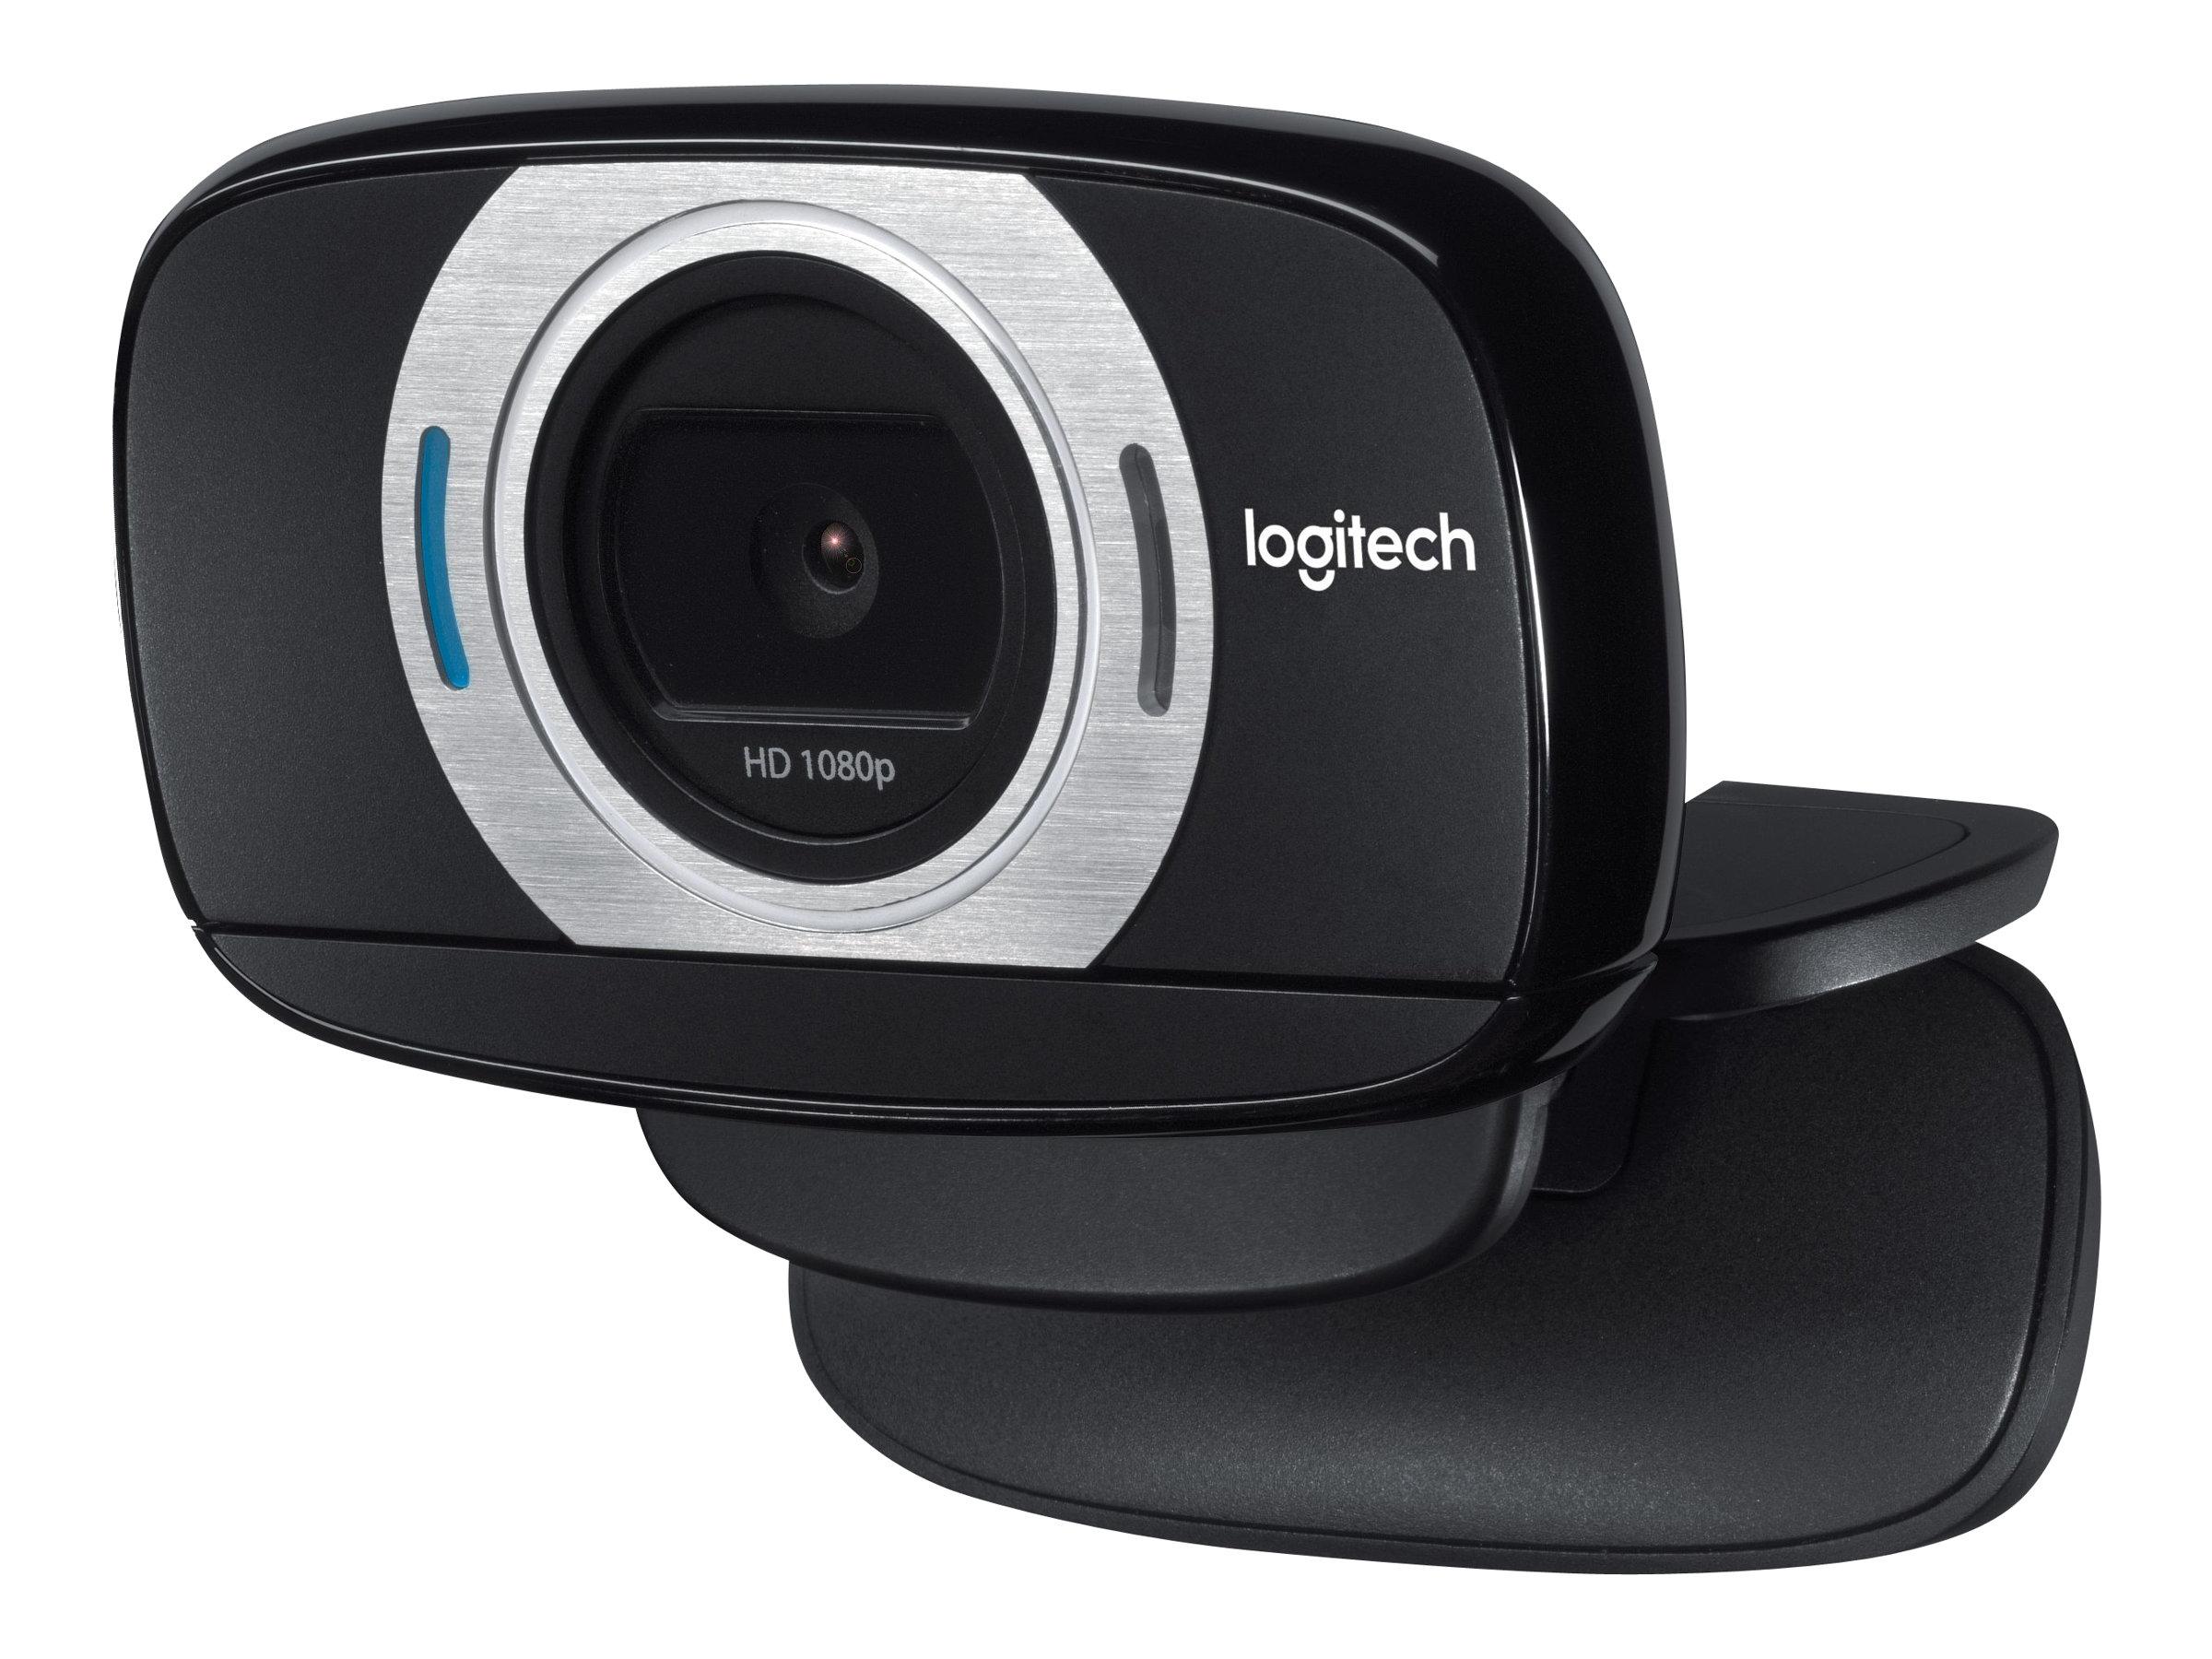 Logitech HD Webcam C615 - Web-Kamera - Farbe - 1920 x 1080 - Audio - USB 2.0